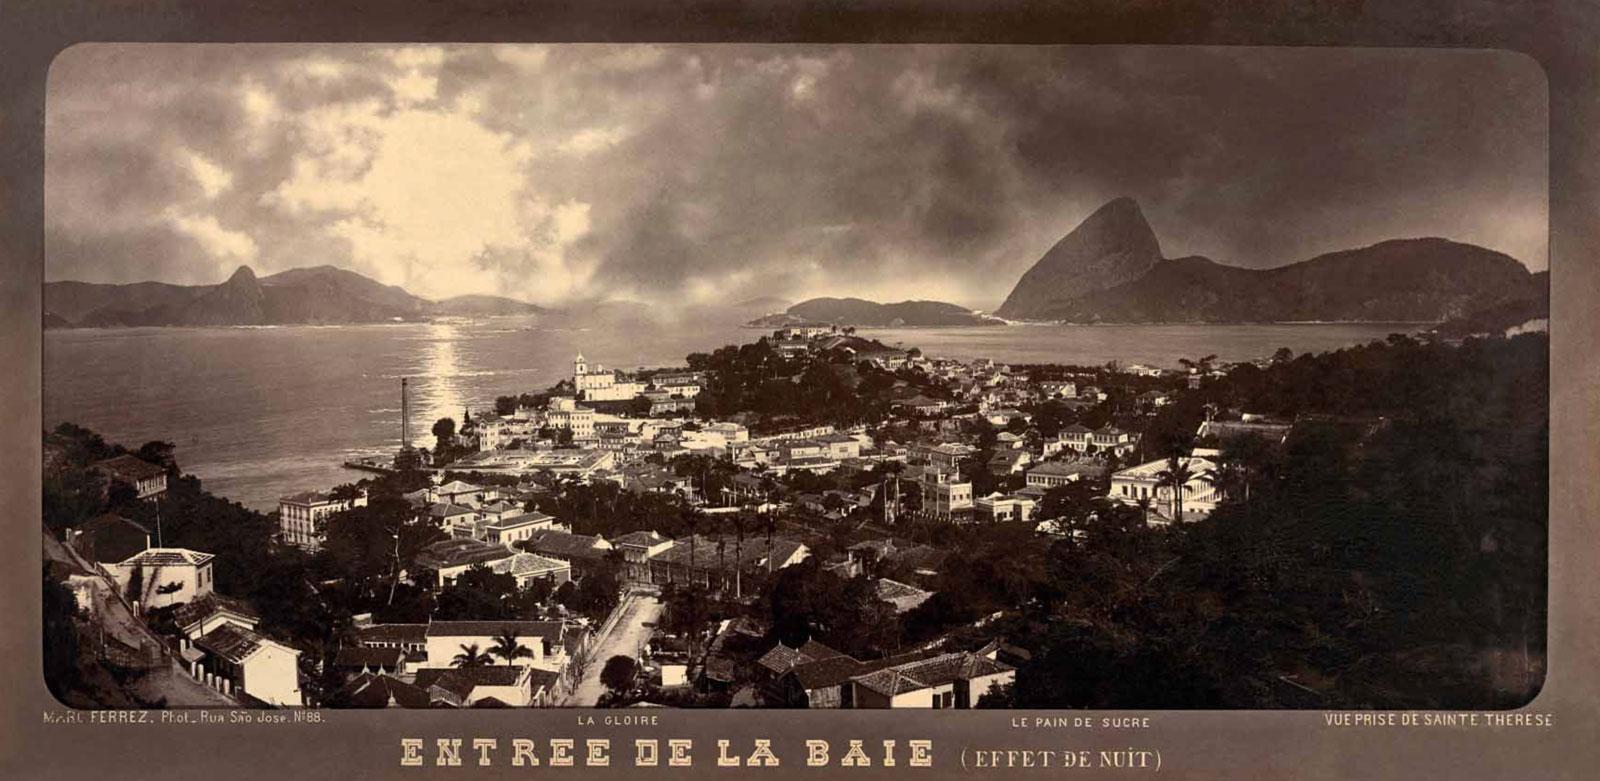 <em>Entrée de la Baie (Effet de Nuit)</em> (entrance to Guanabara Bay with a view of the Sugarloaf Mountain), circa 1885